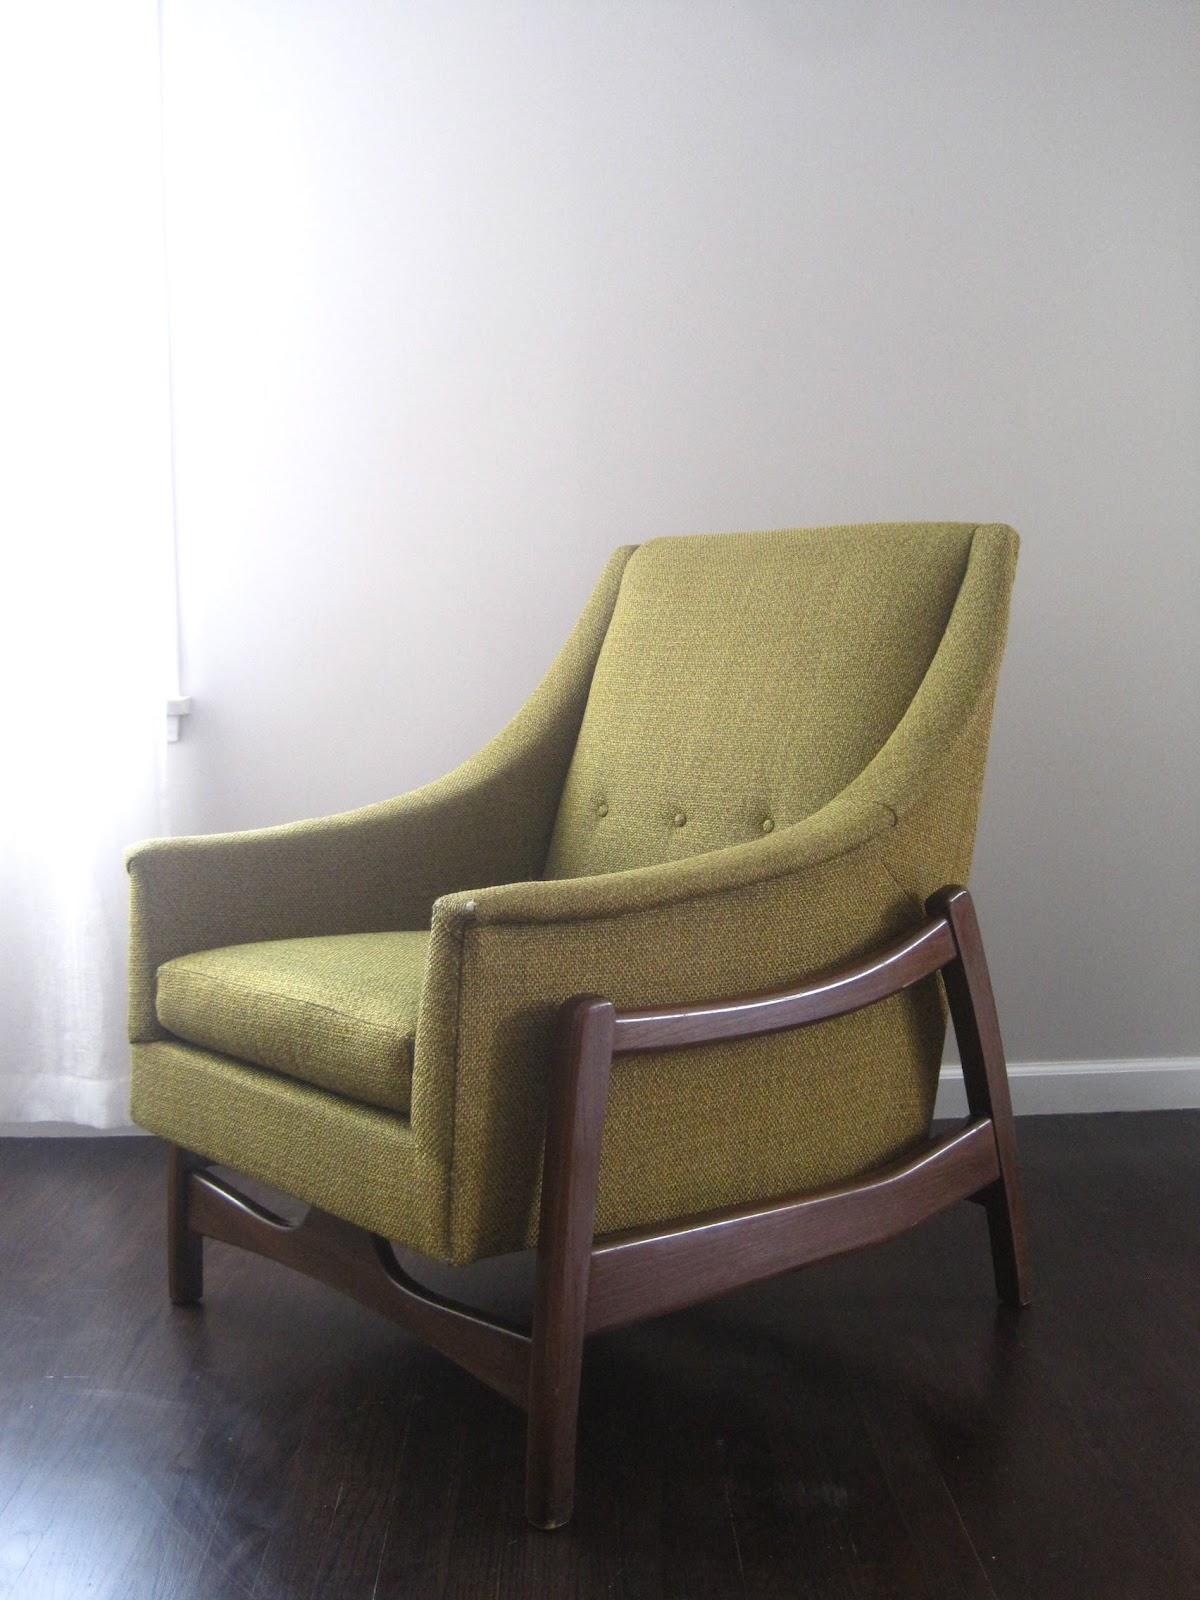 sofa rocking chair old leather rhan vintage mid century modern blog paoli